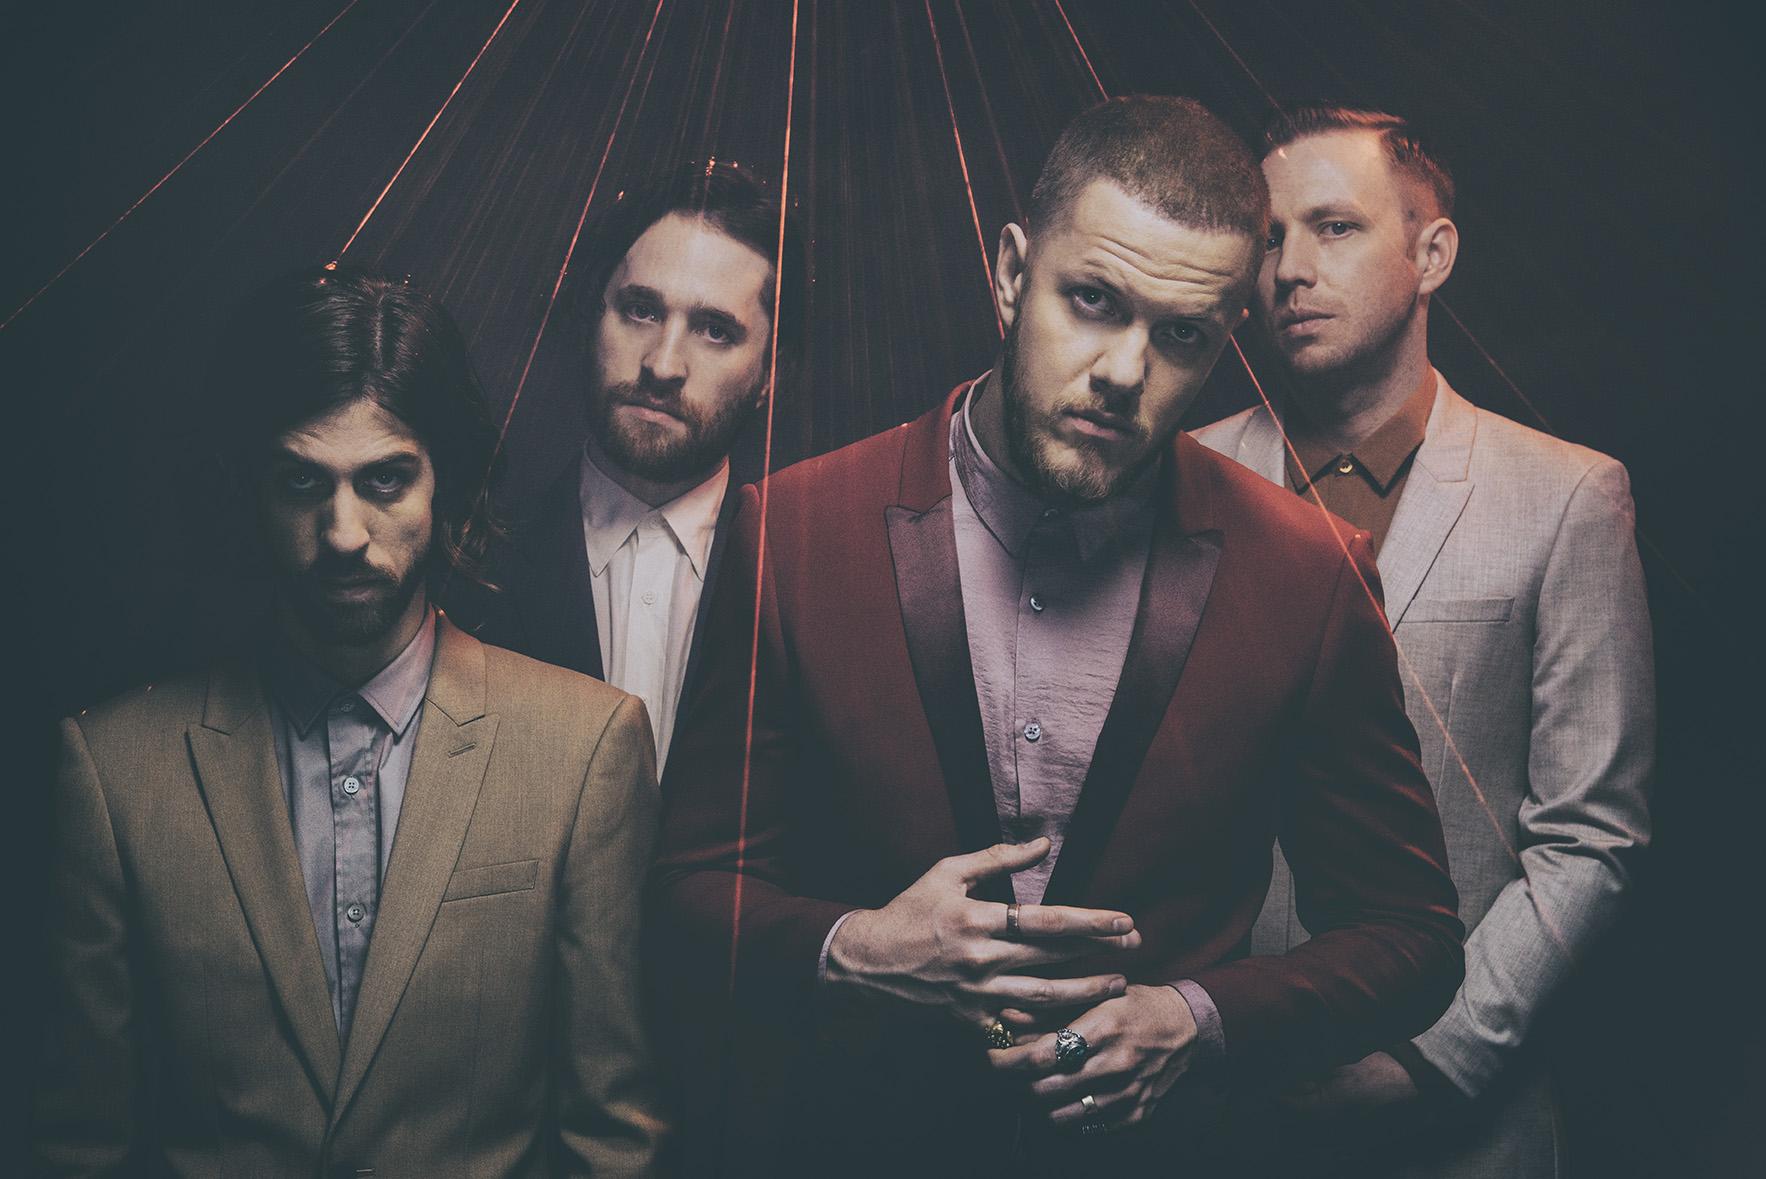 Chart topping rockers Imagine Dragons Evolve at Hersheypark Stadium on June 16